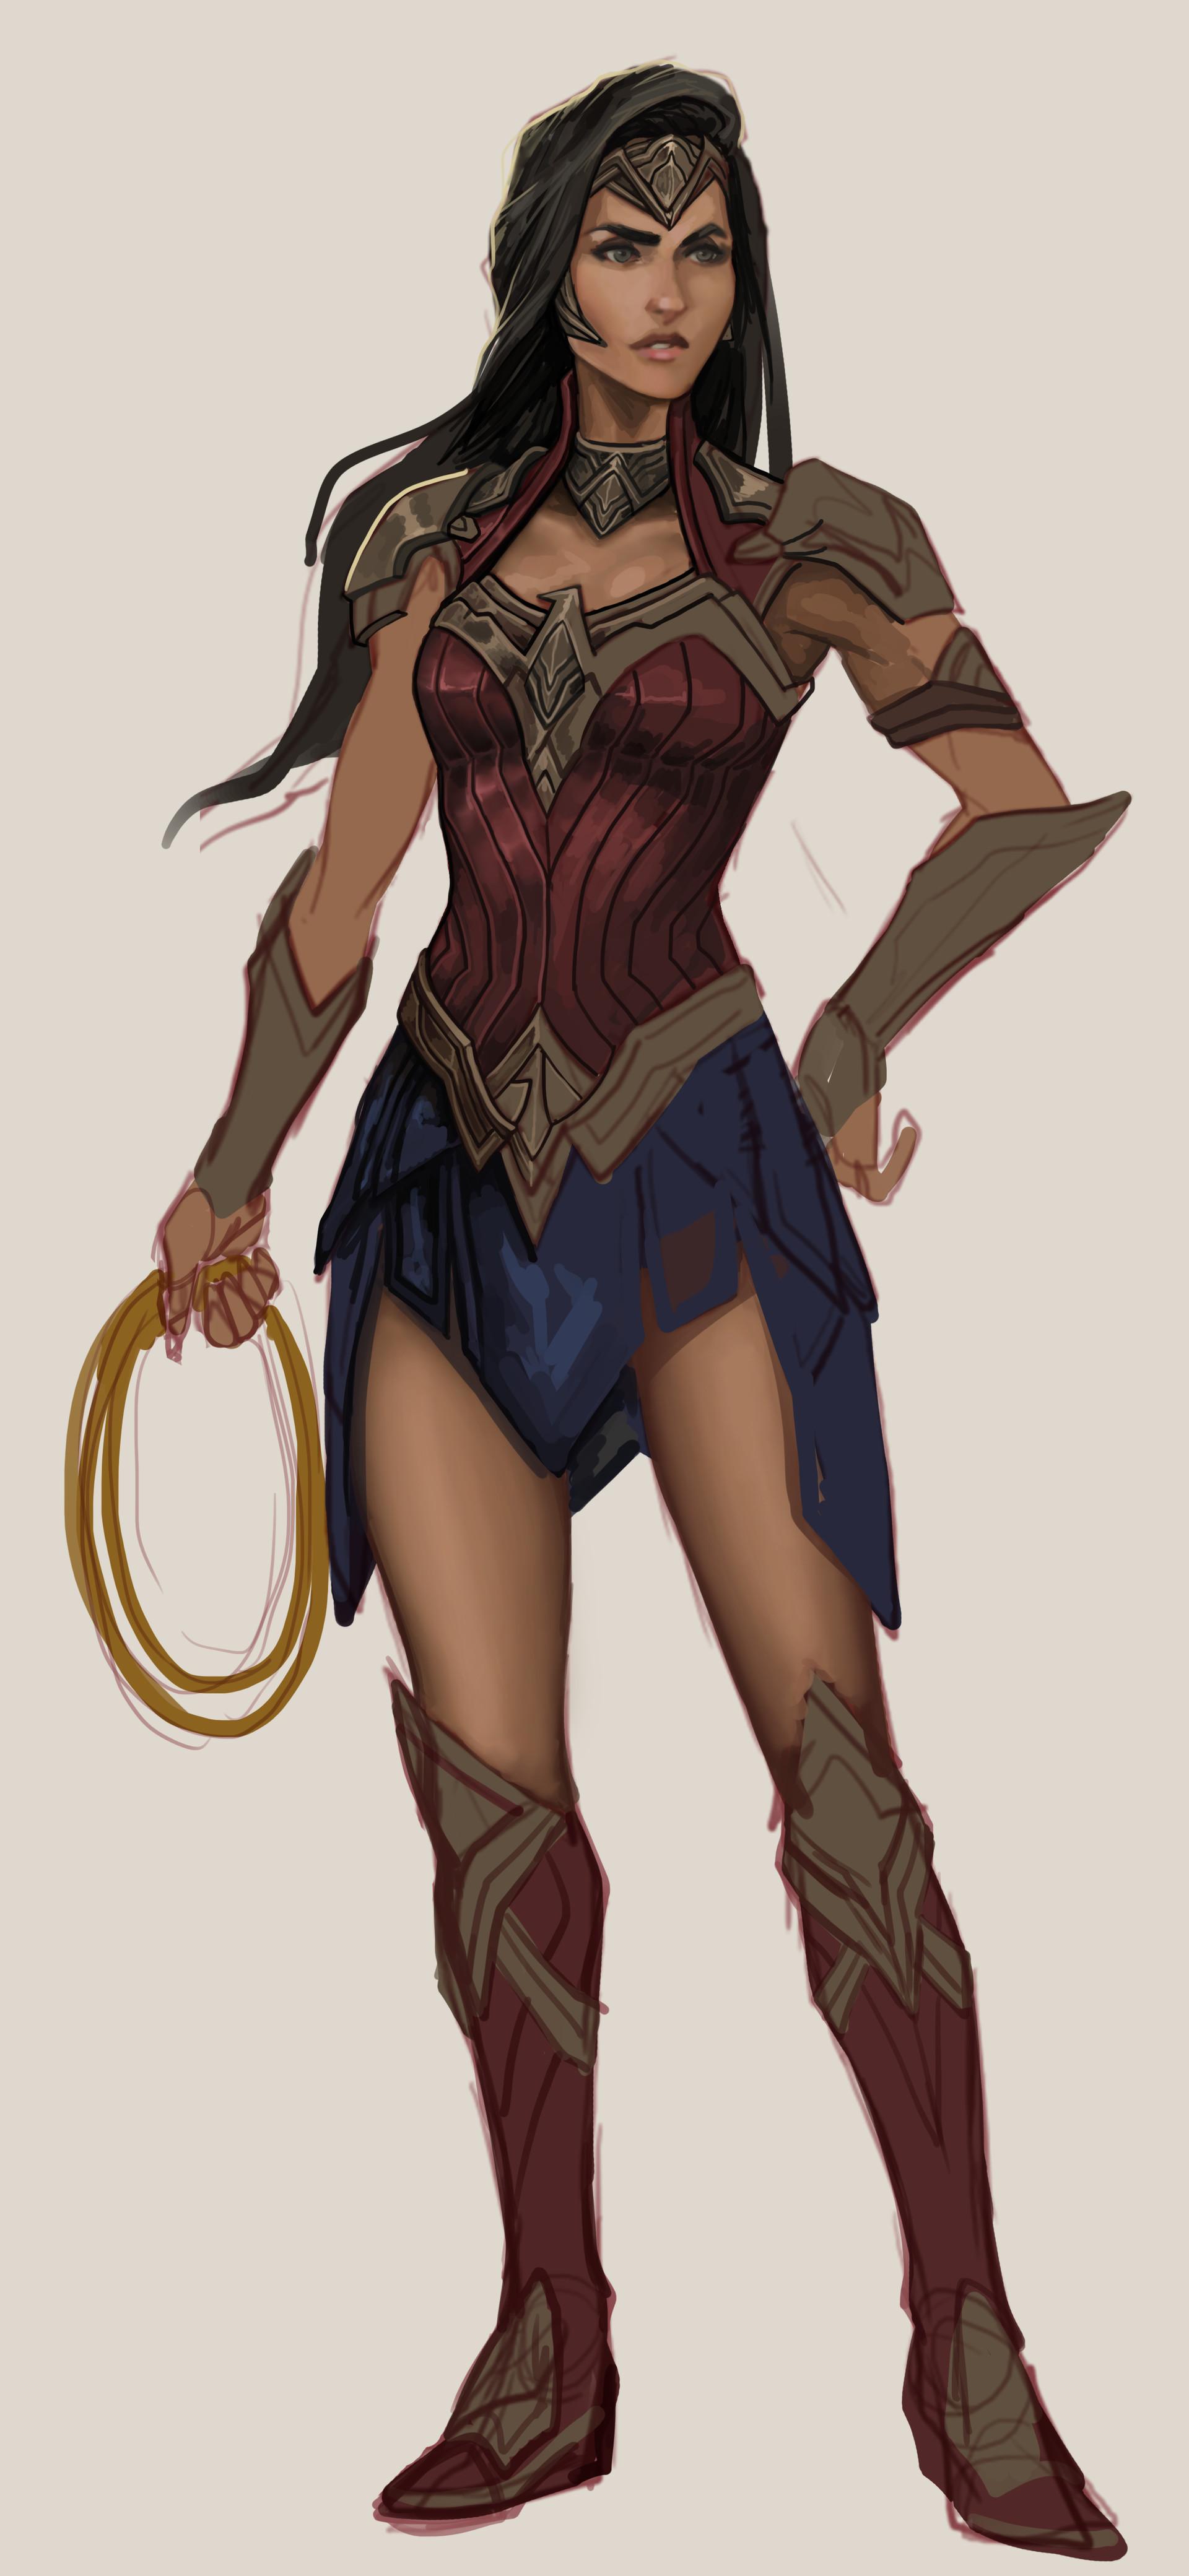 Thomas randby wonderwoman3